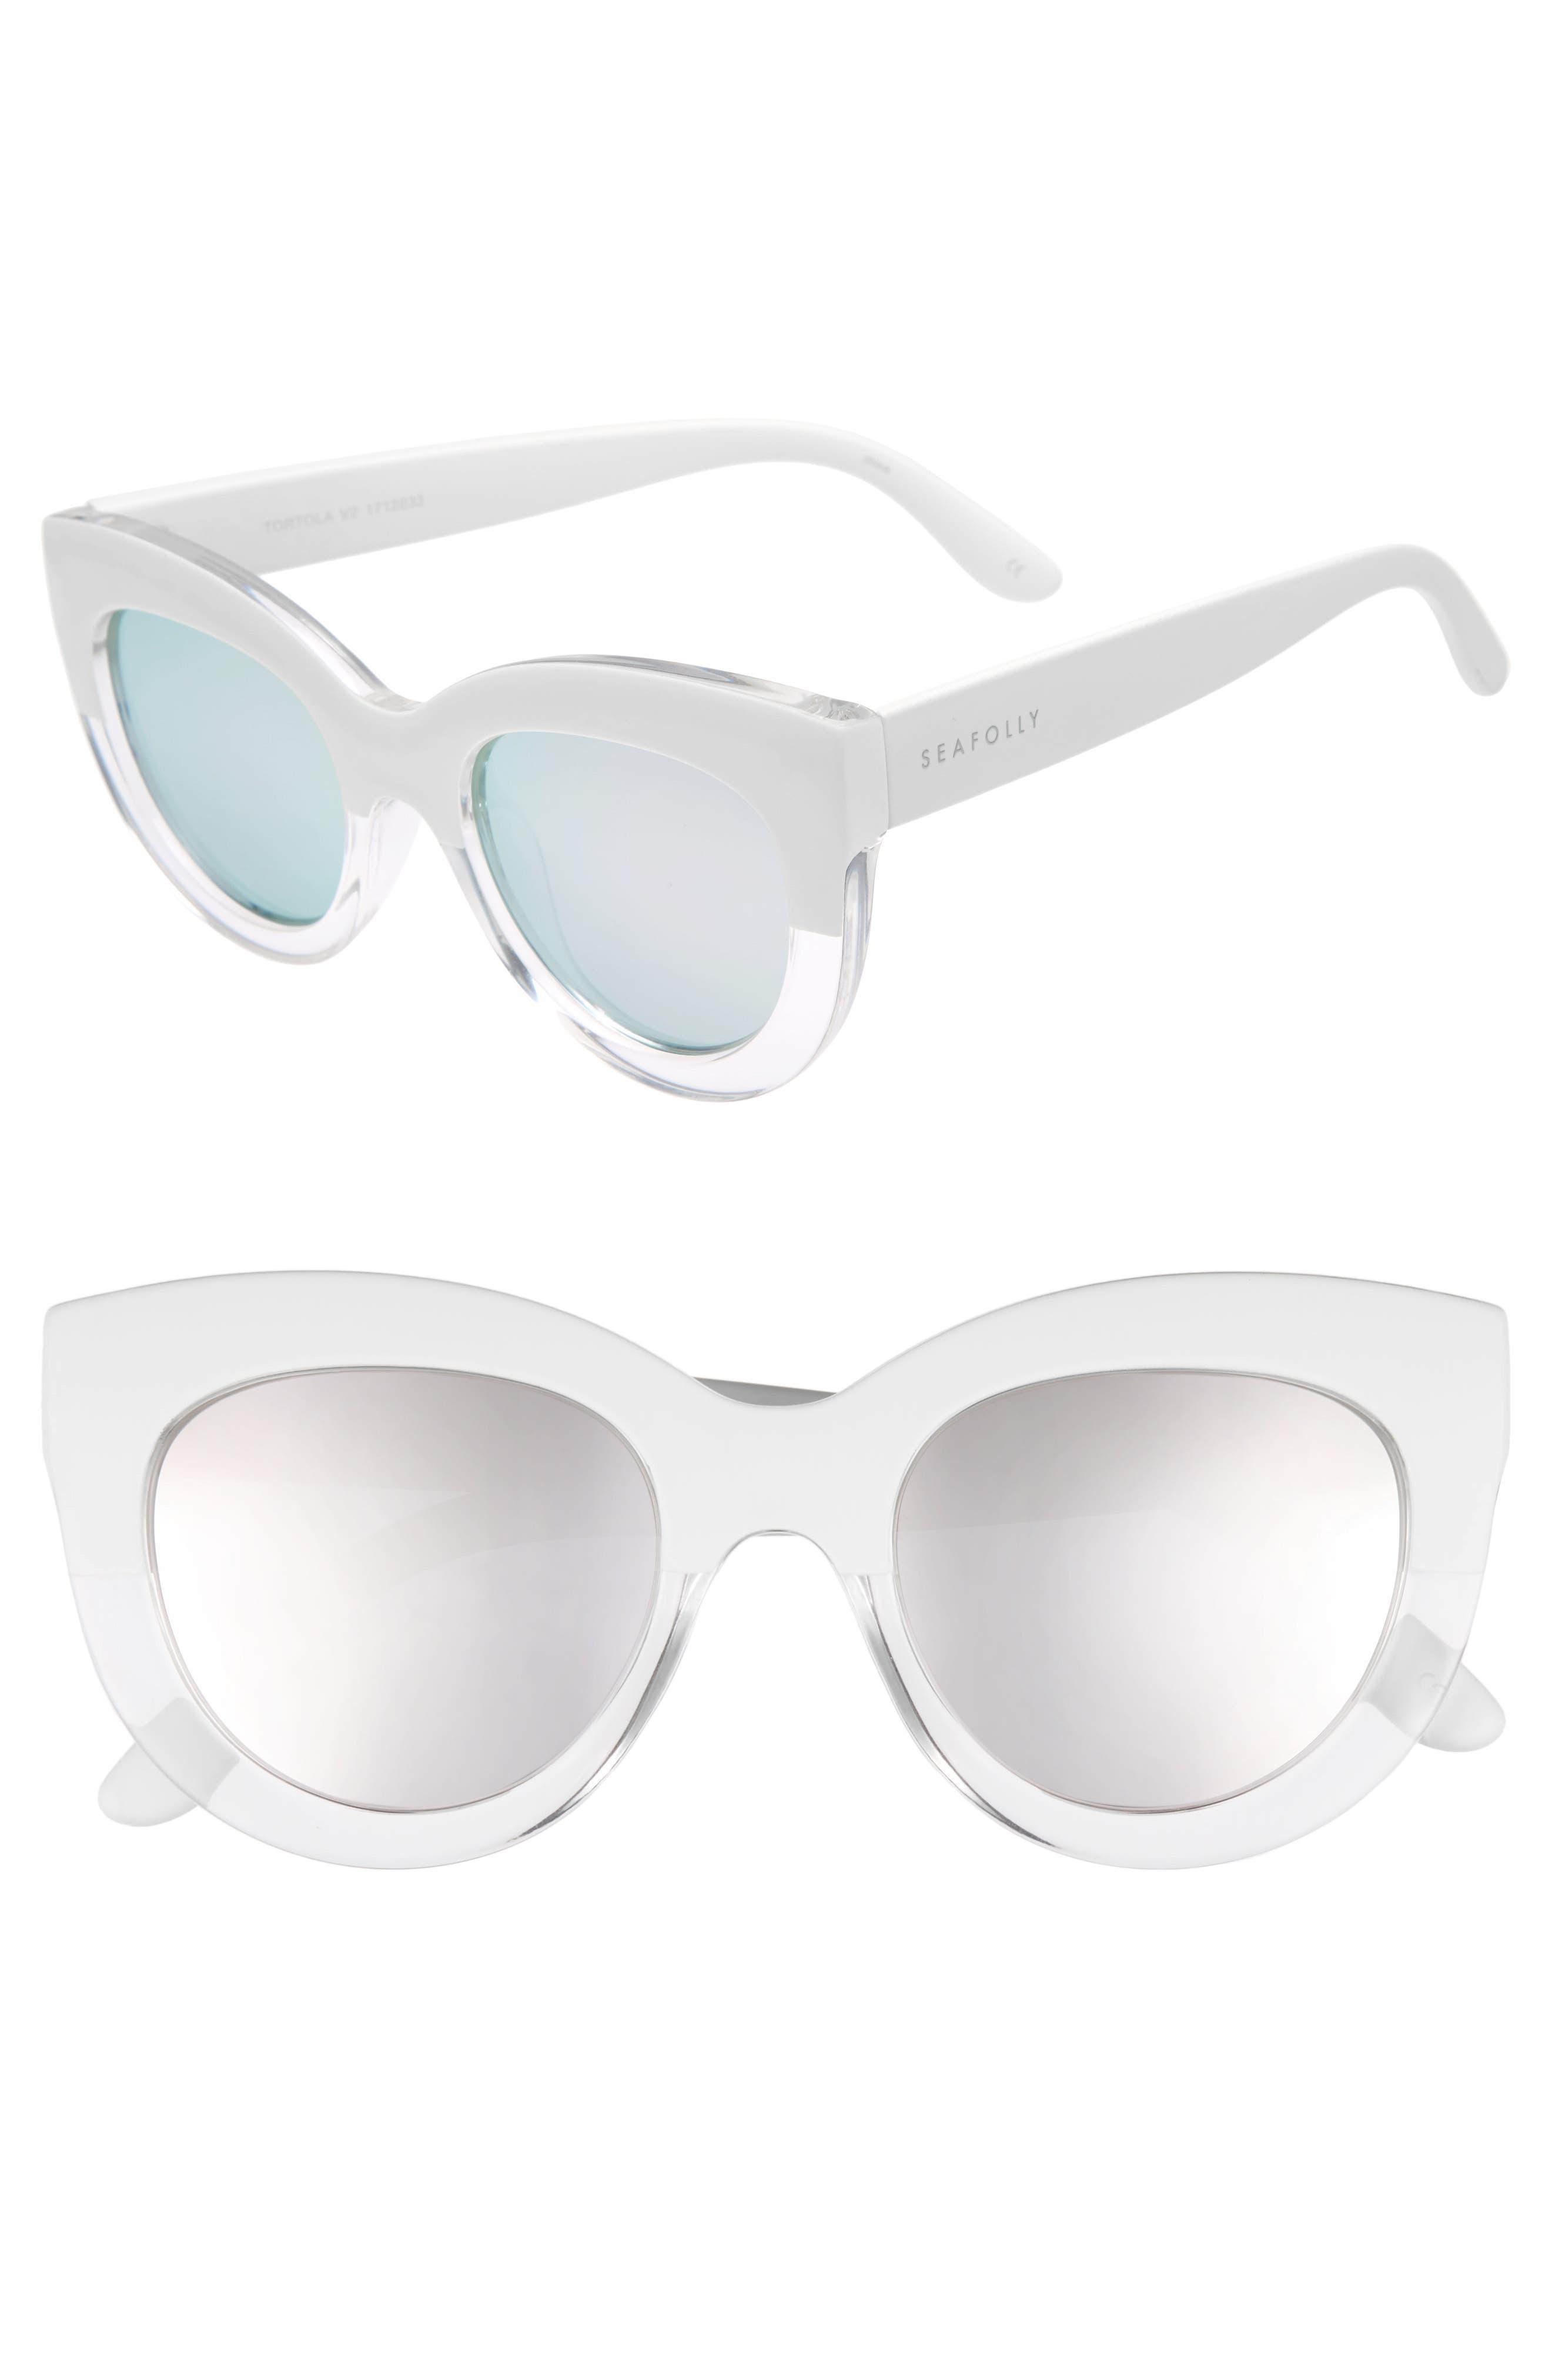 Tortola V2 51mm Polarized Cat Eye Sunglasses,                             Main thumbnail 1, color,                             White Splice